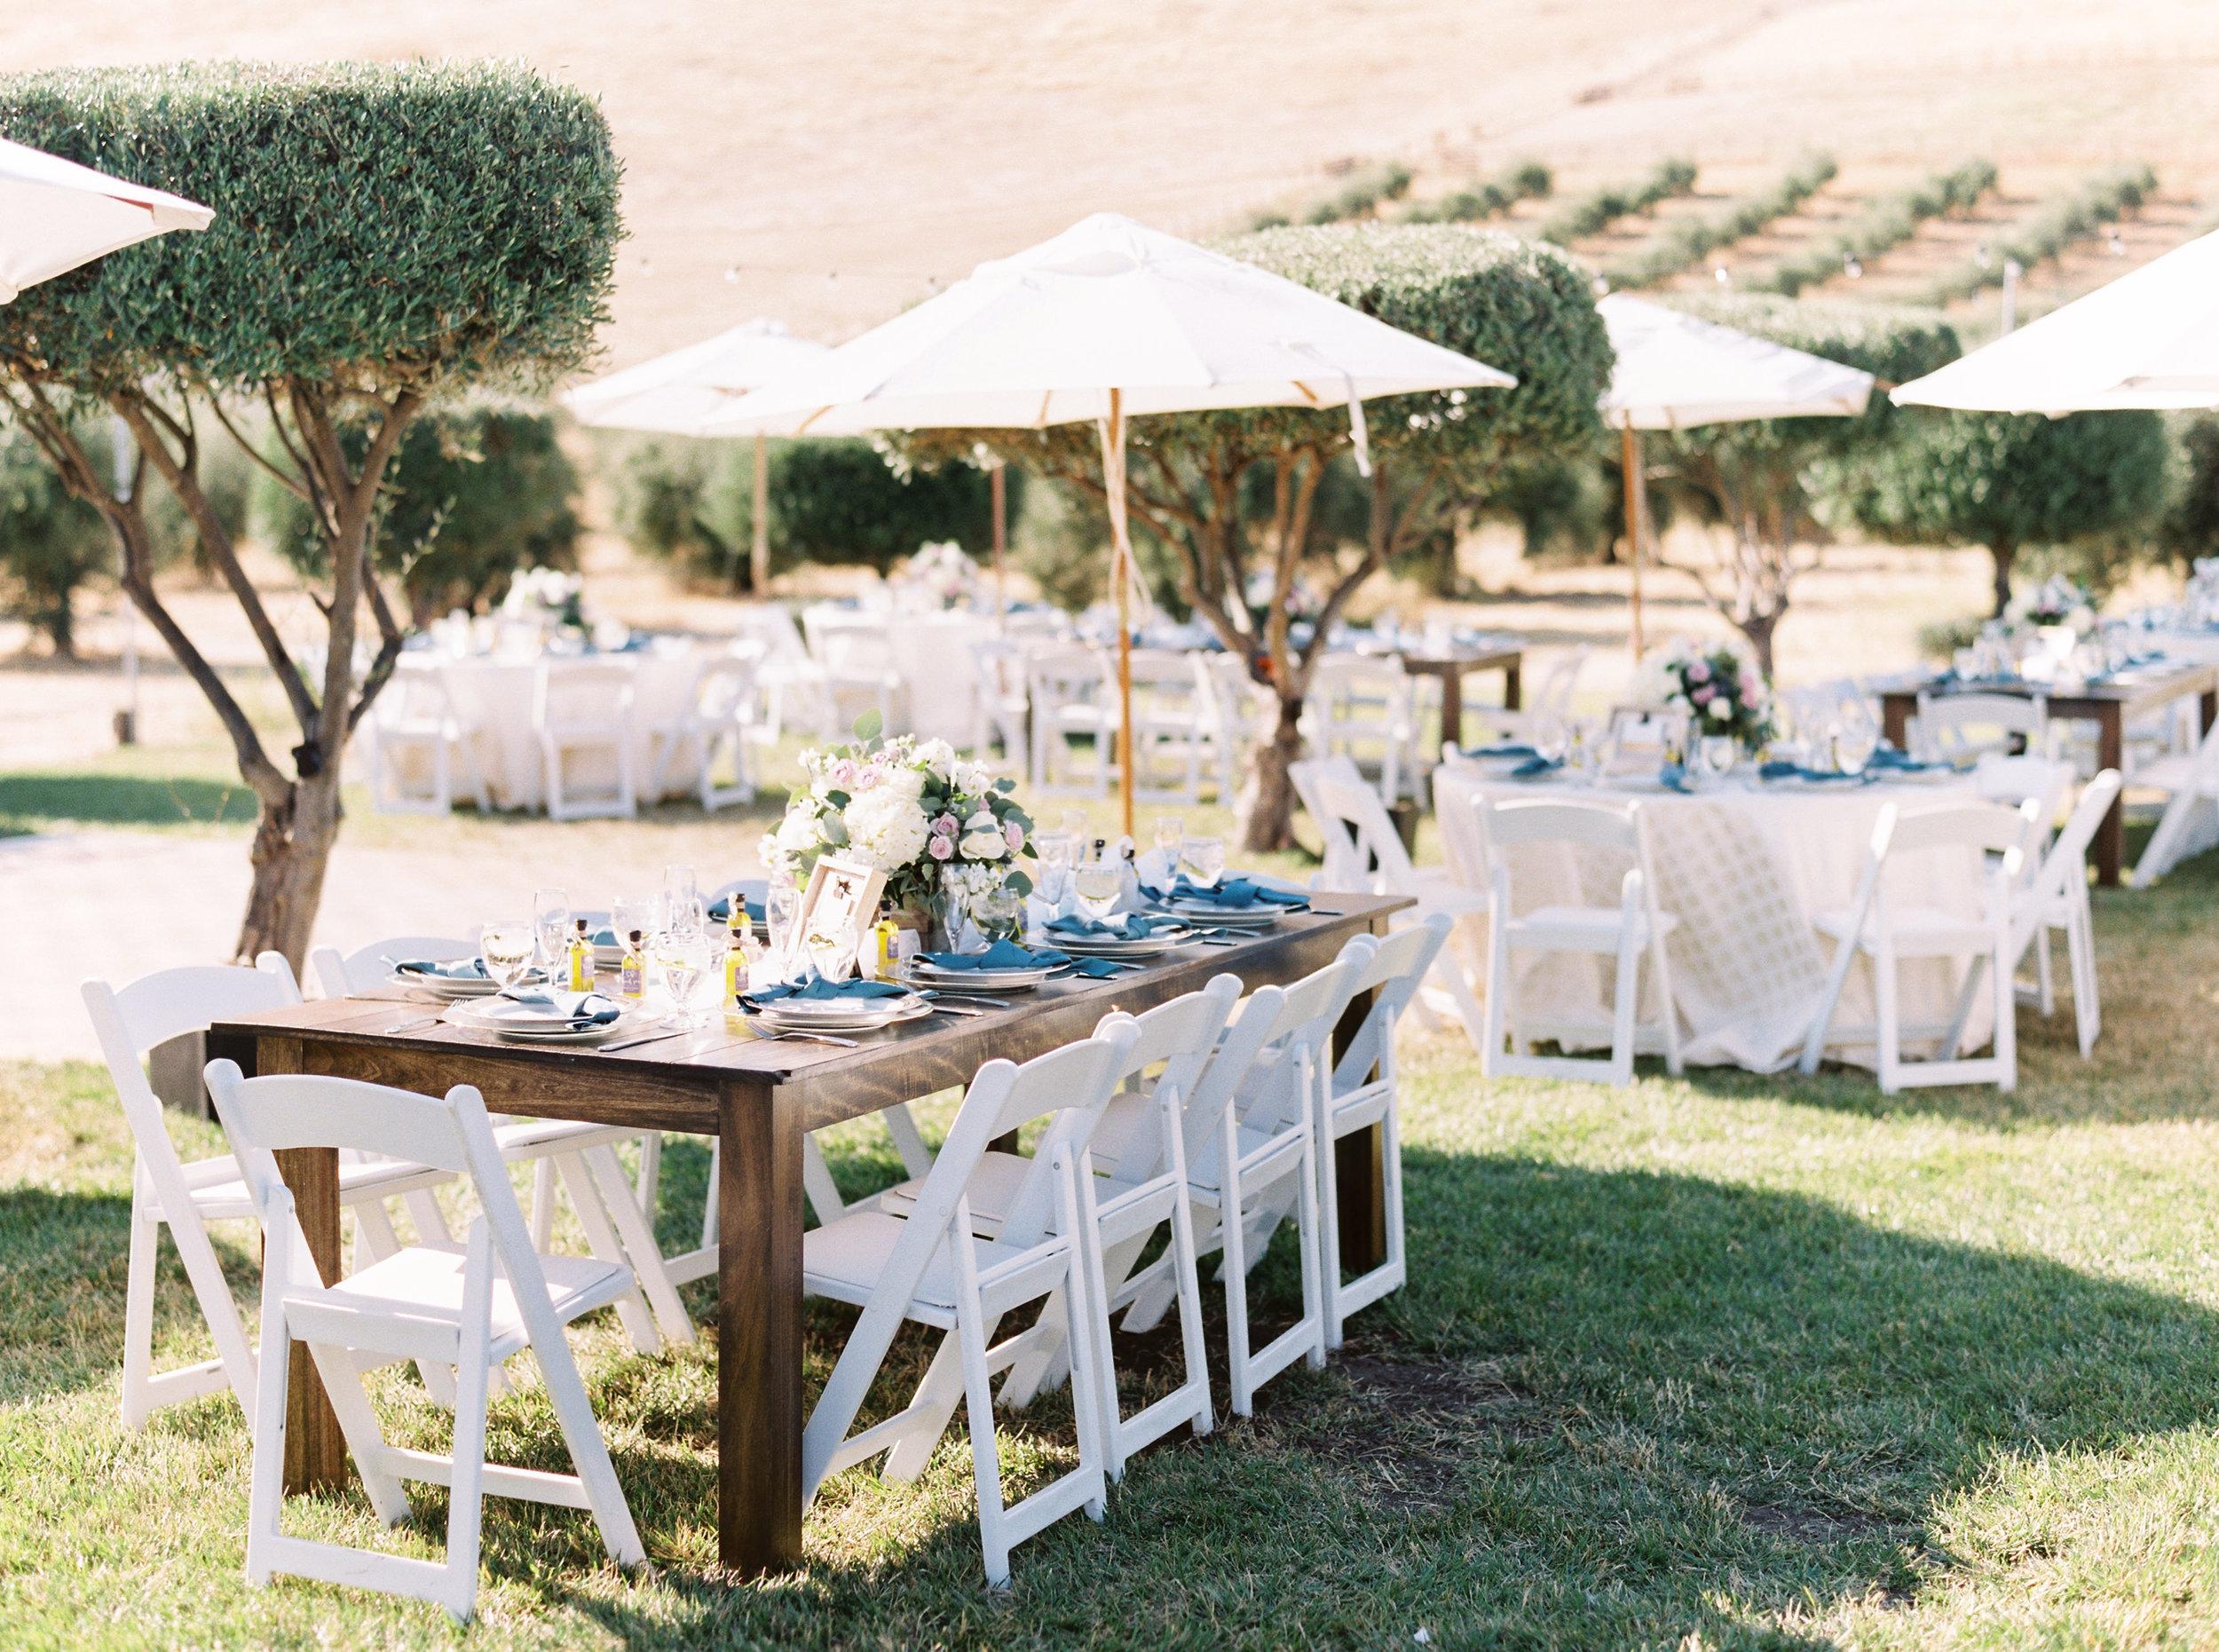 the-purple-orchid-resort-wedding-in-livermore-california-238.jpg